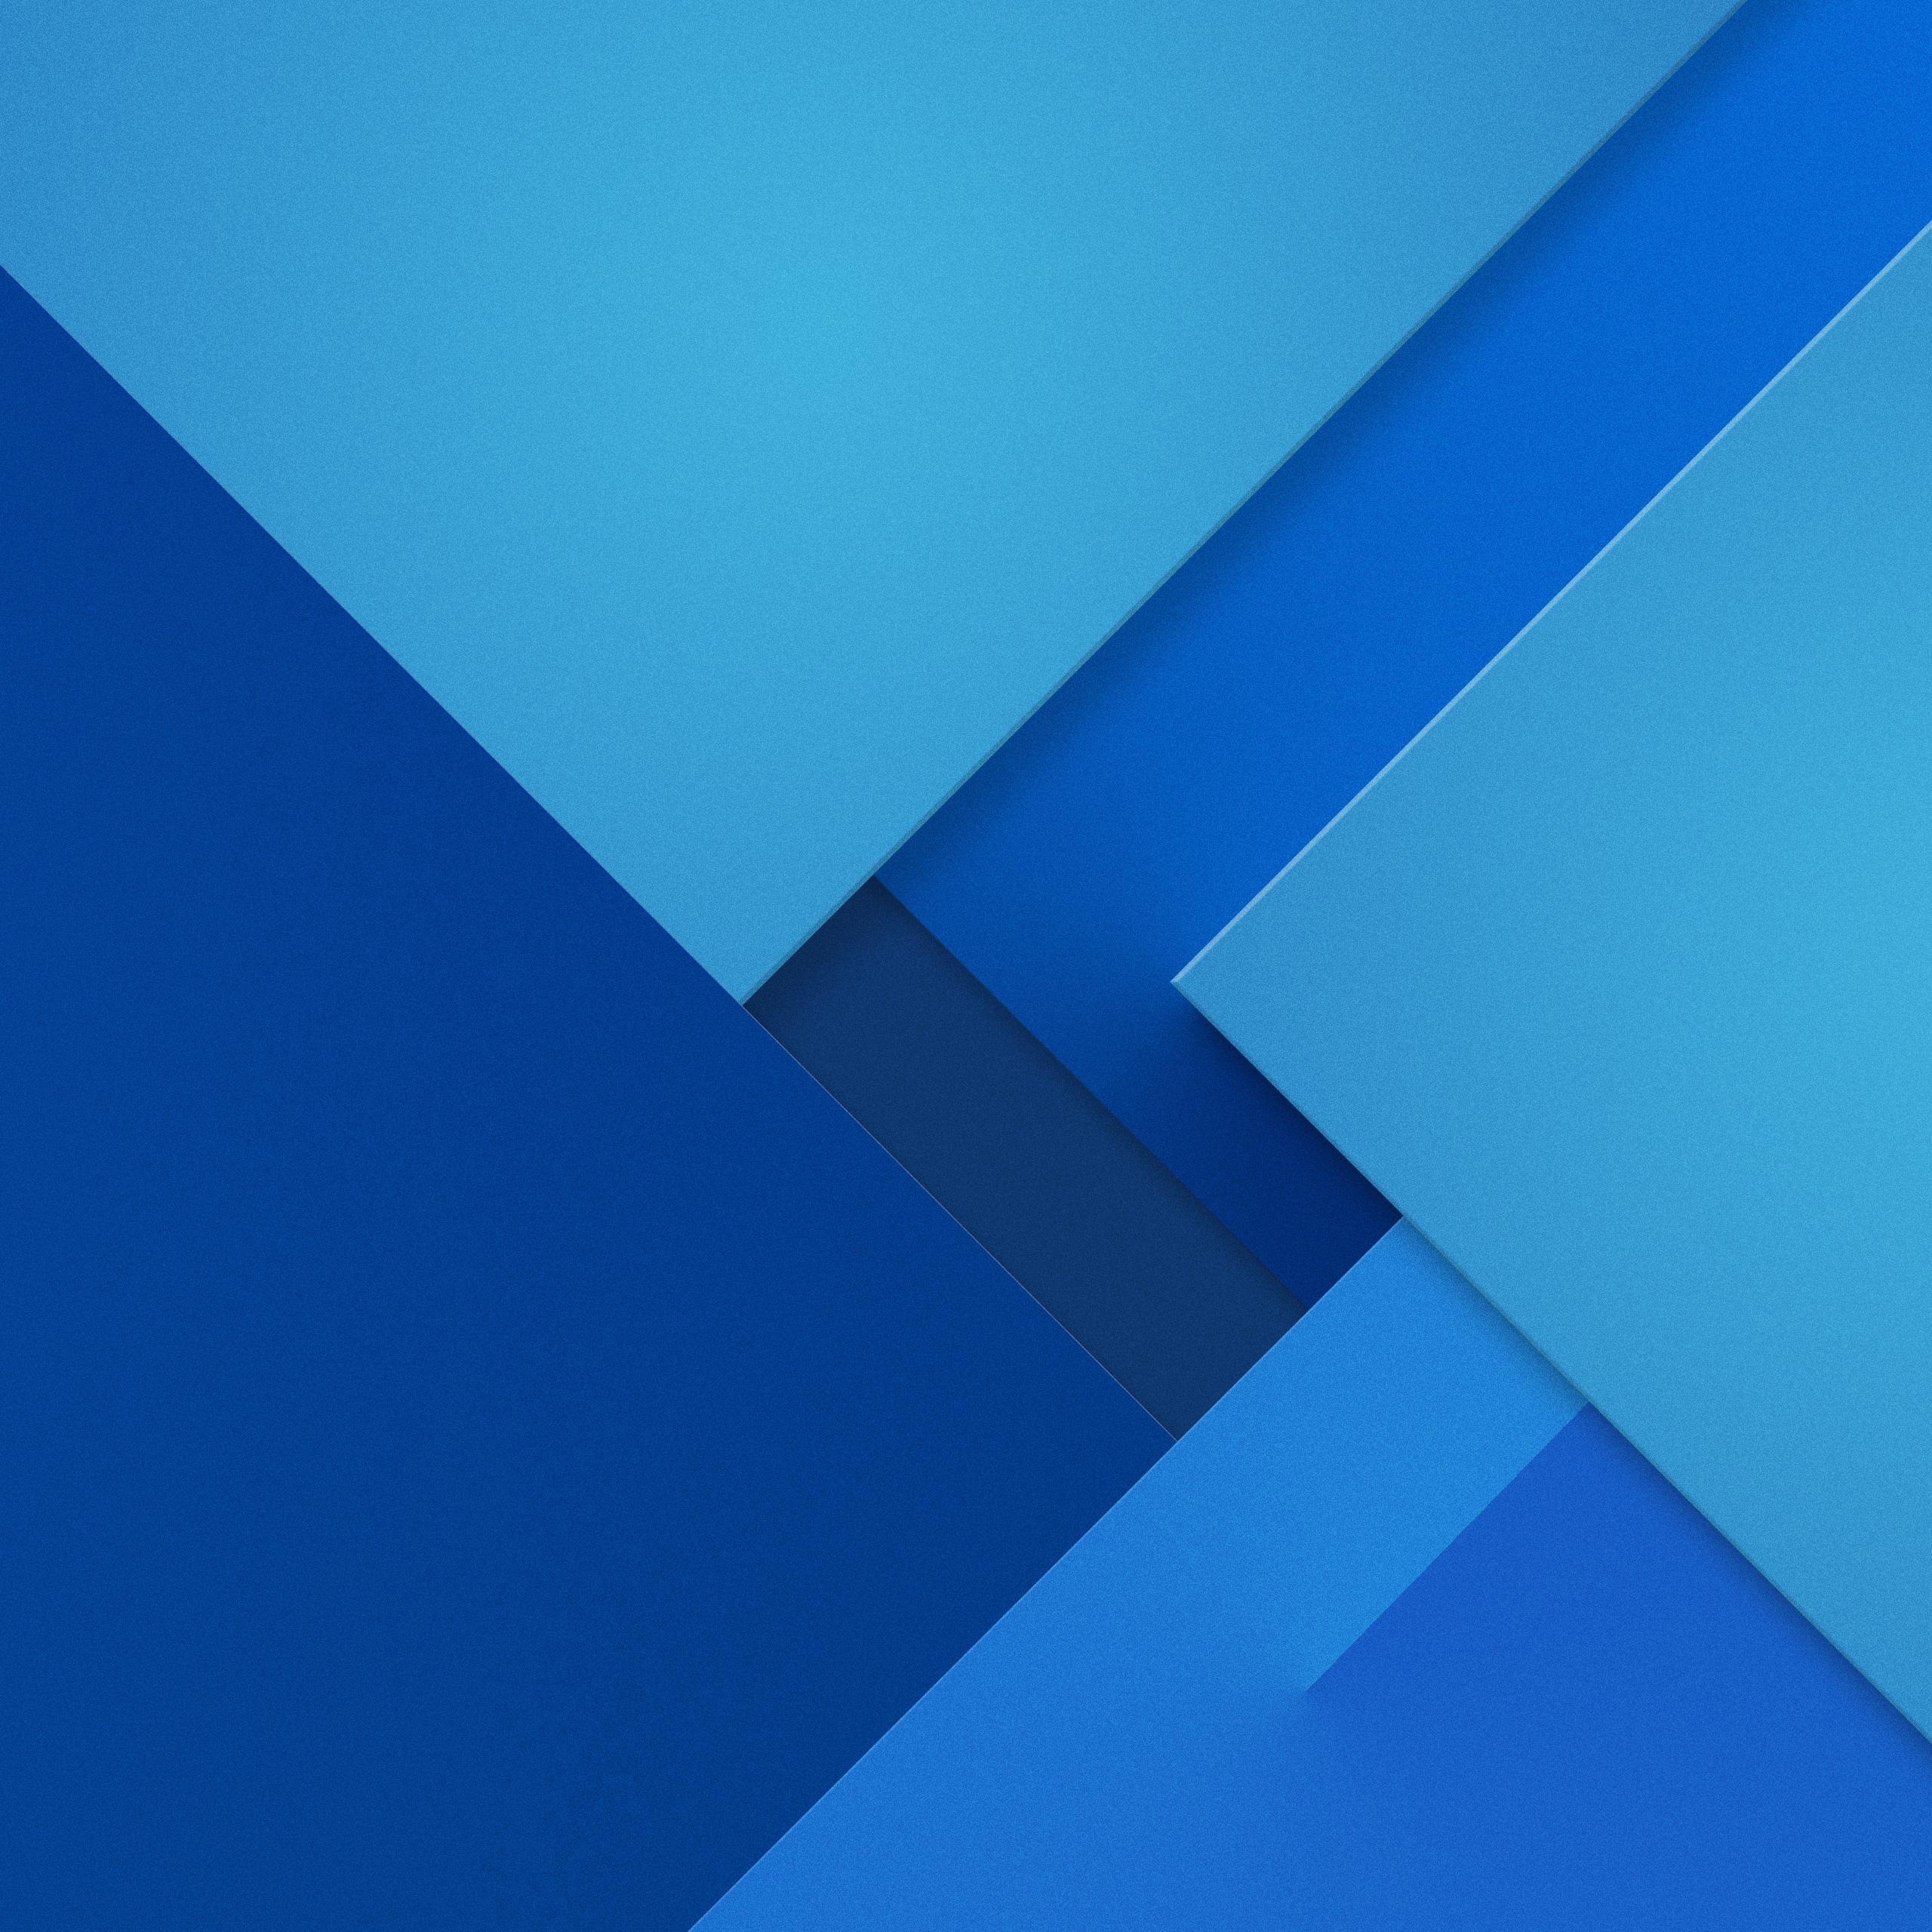 Samsung Galaxy S7 Wallpaper 7 Download